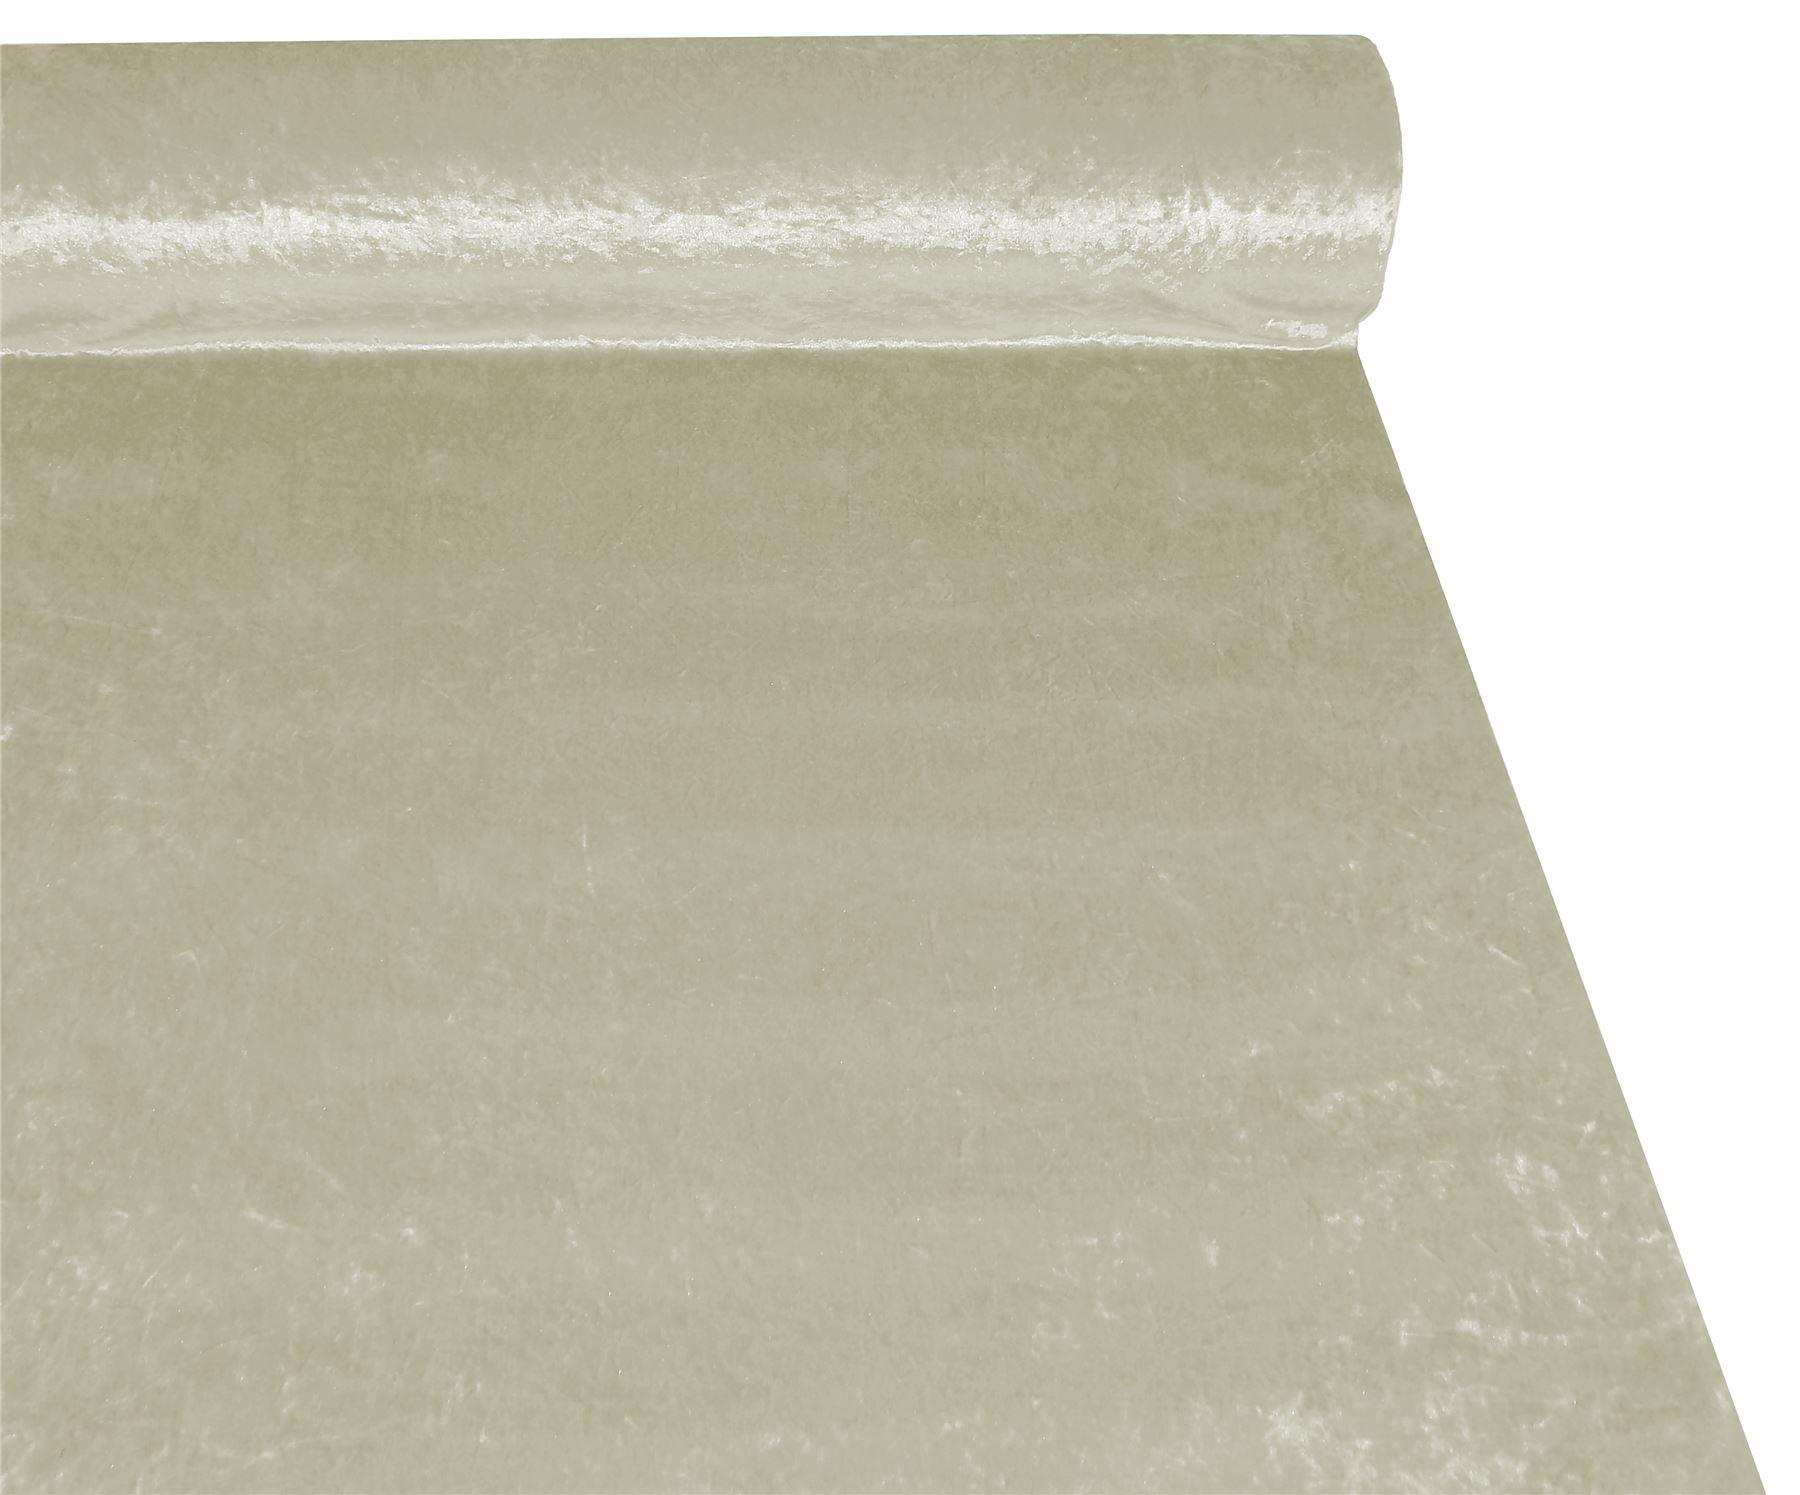 Beige Crushed Velvet material de tela de alta calidad 3 Tamaños *